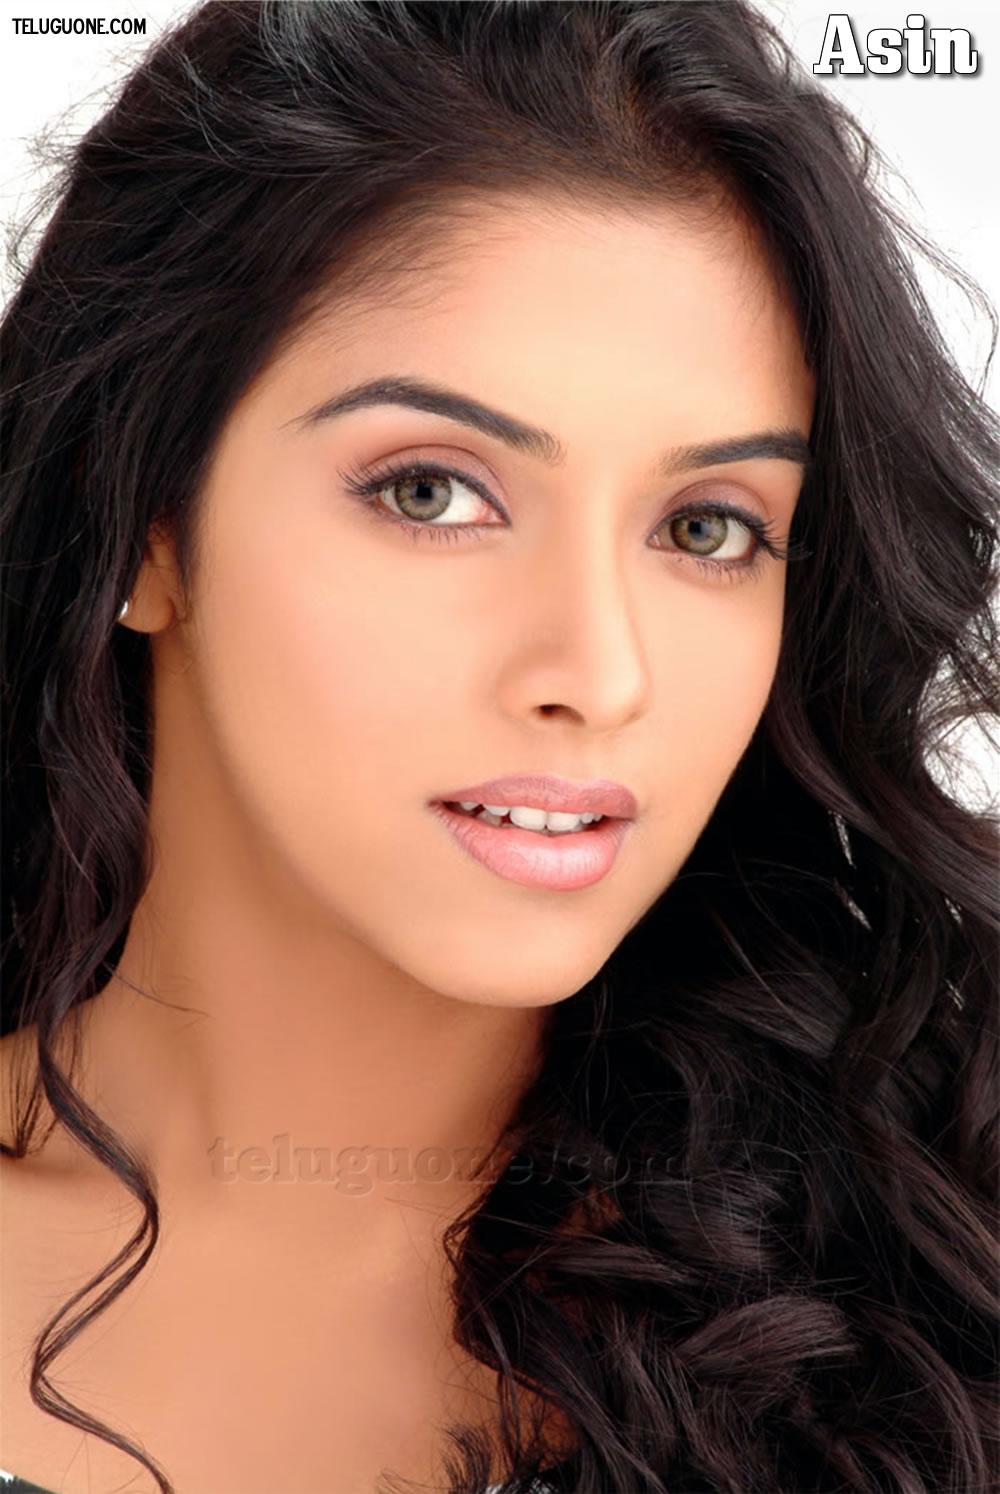 South Indian Actress Stills,Wallpapers: ASIN HOT STILLS